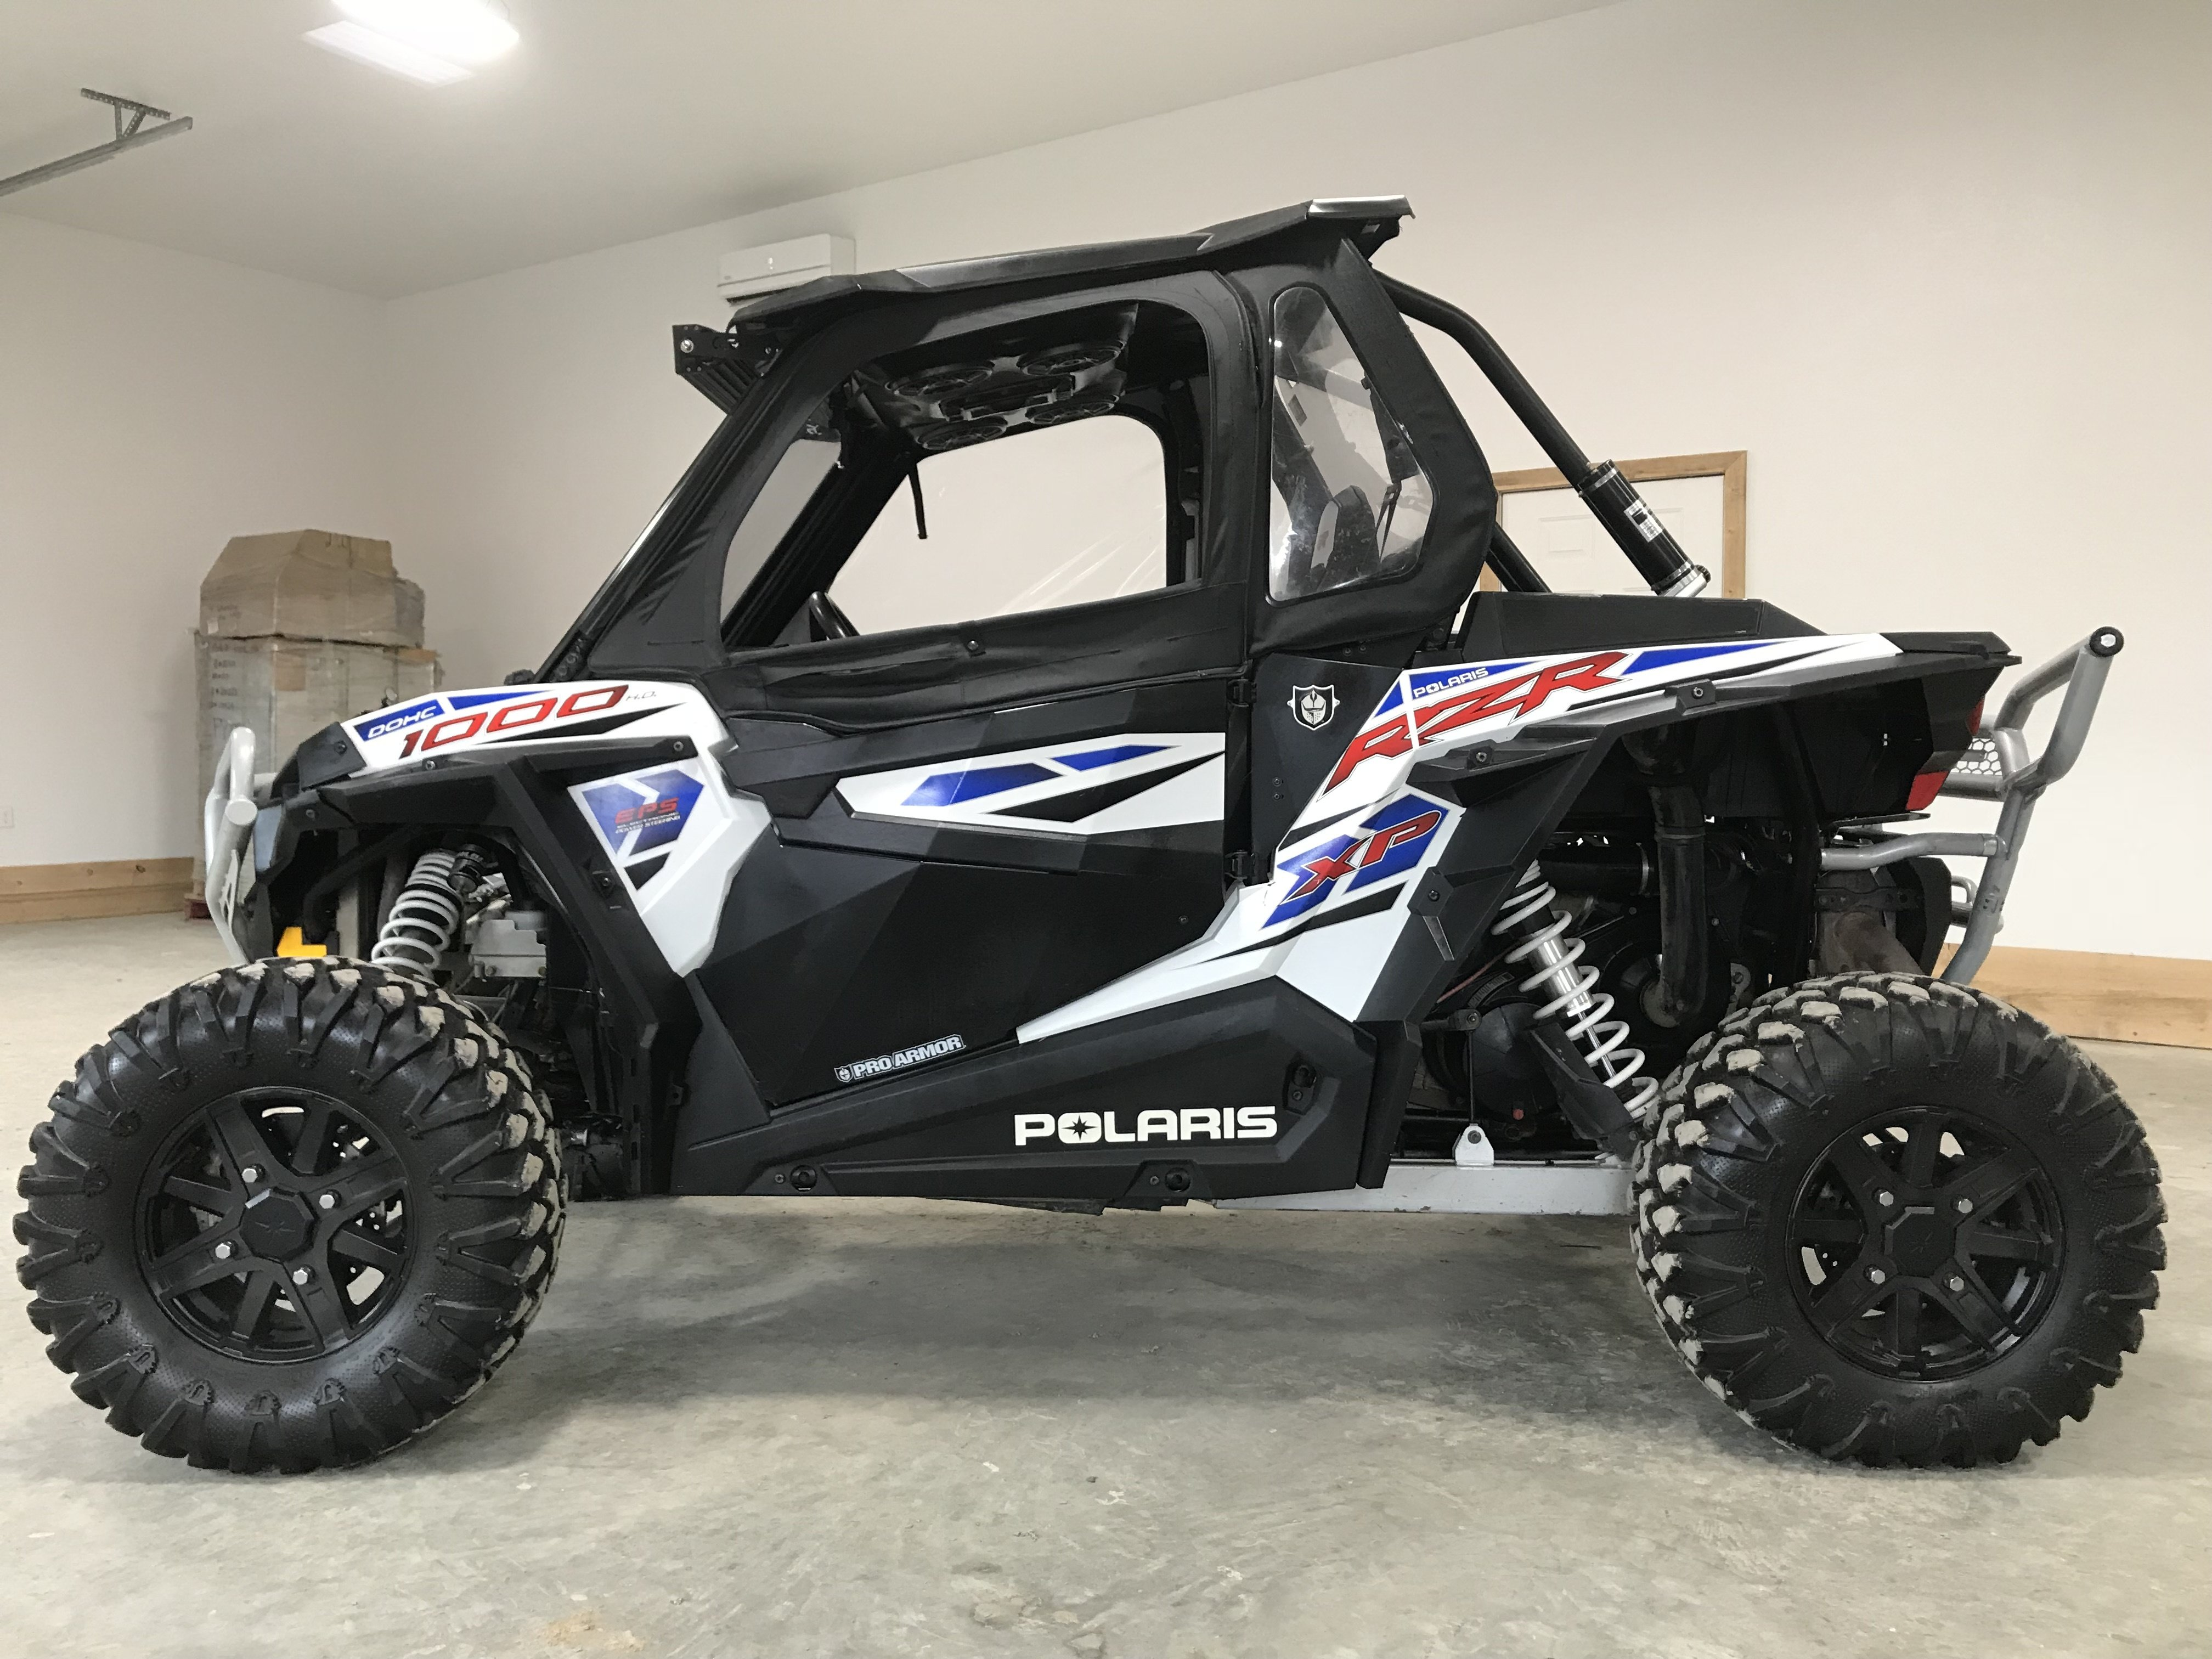 2015 Polaris RZR XP 1000 EPS - Fully Enclosed